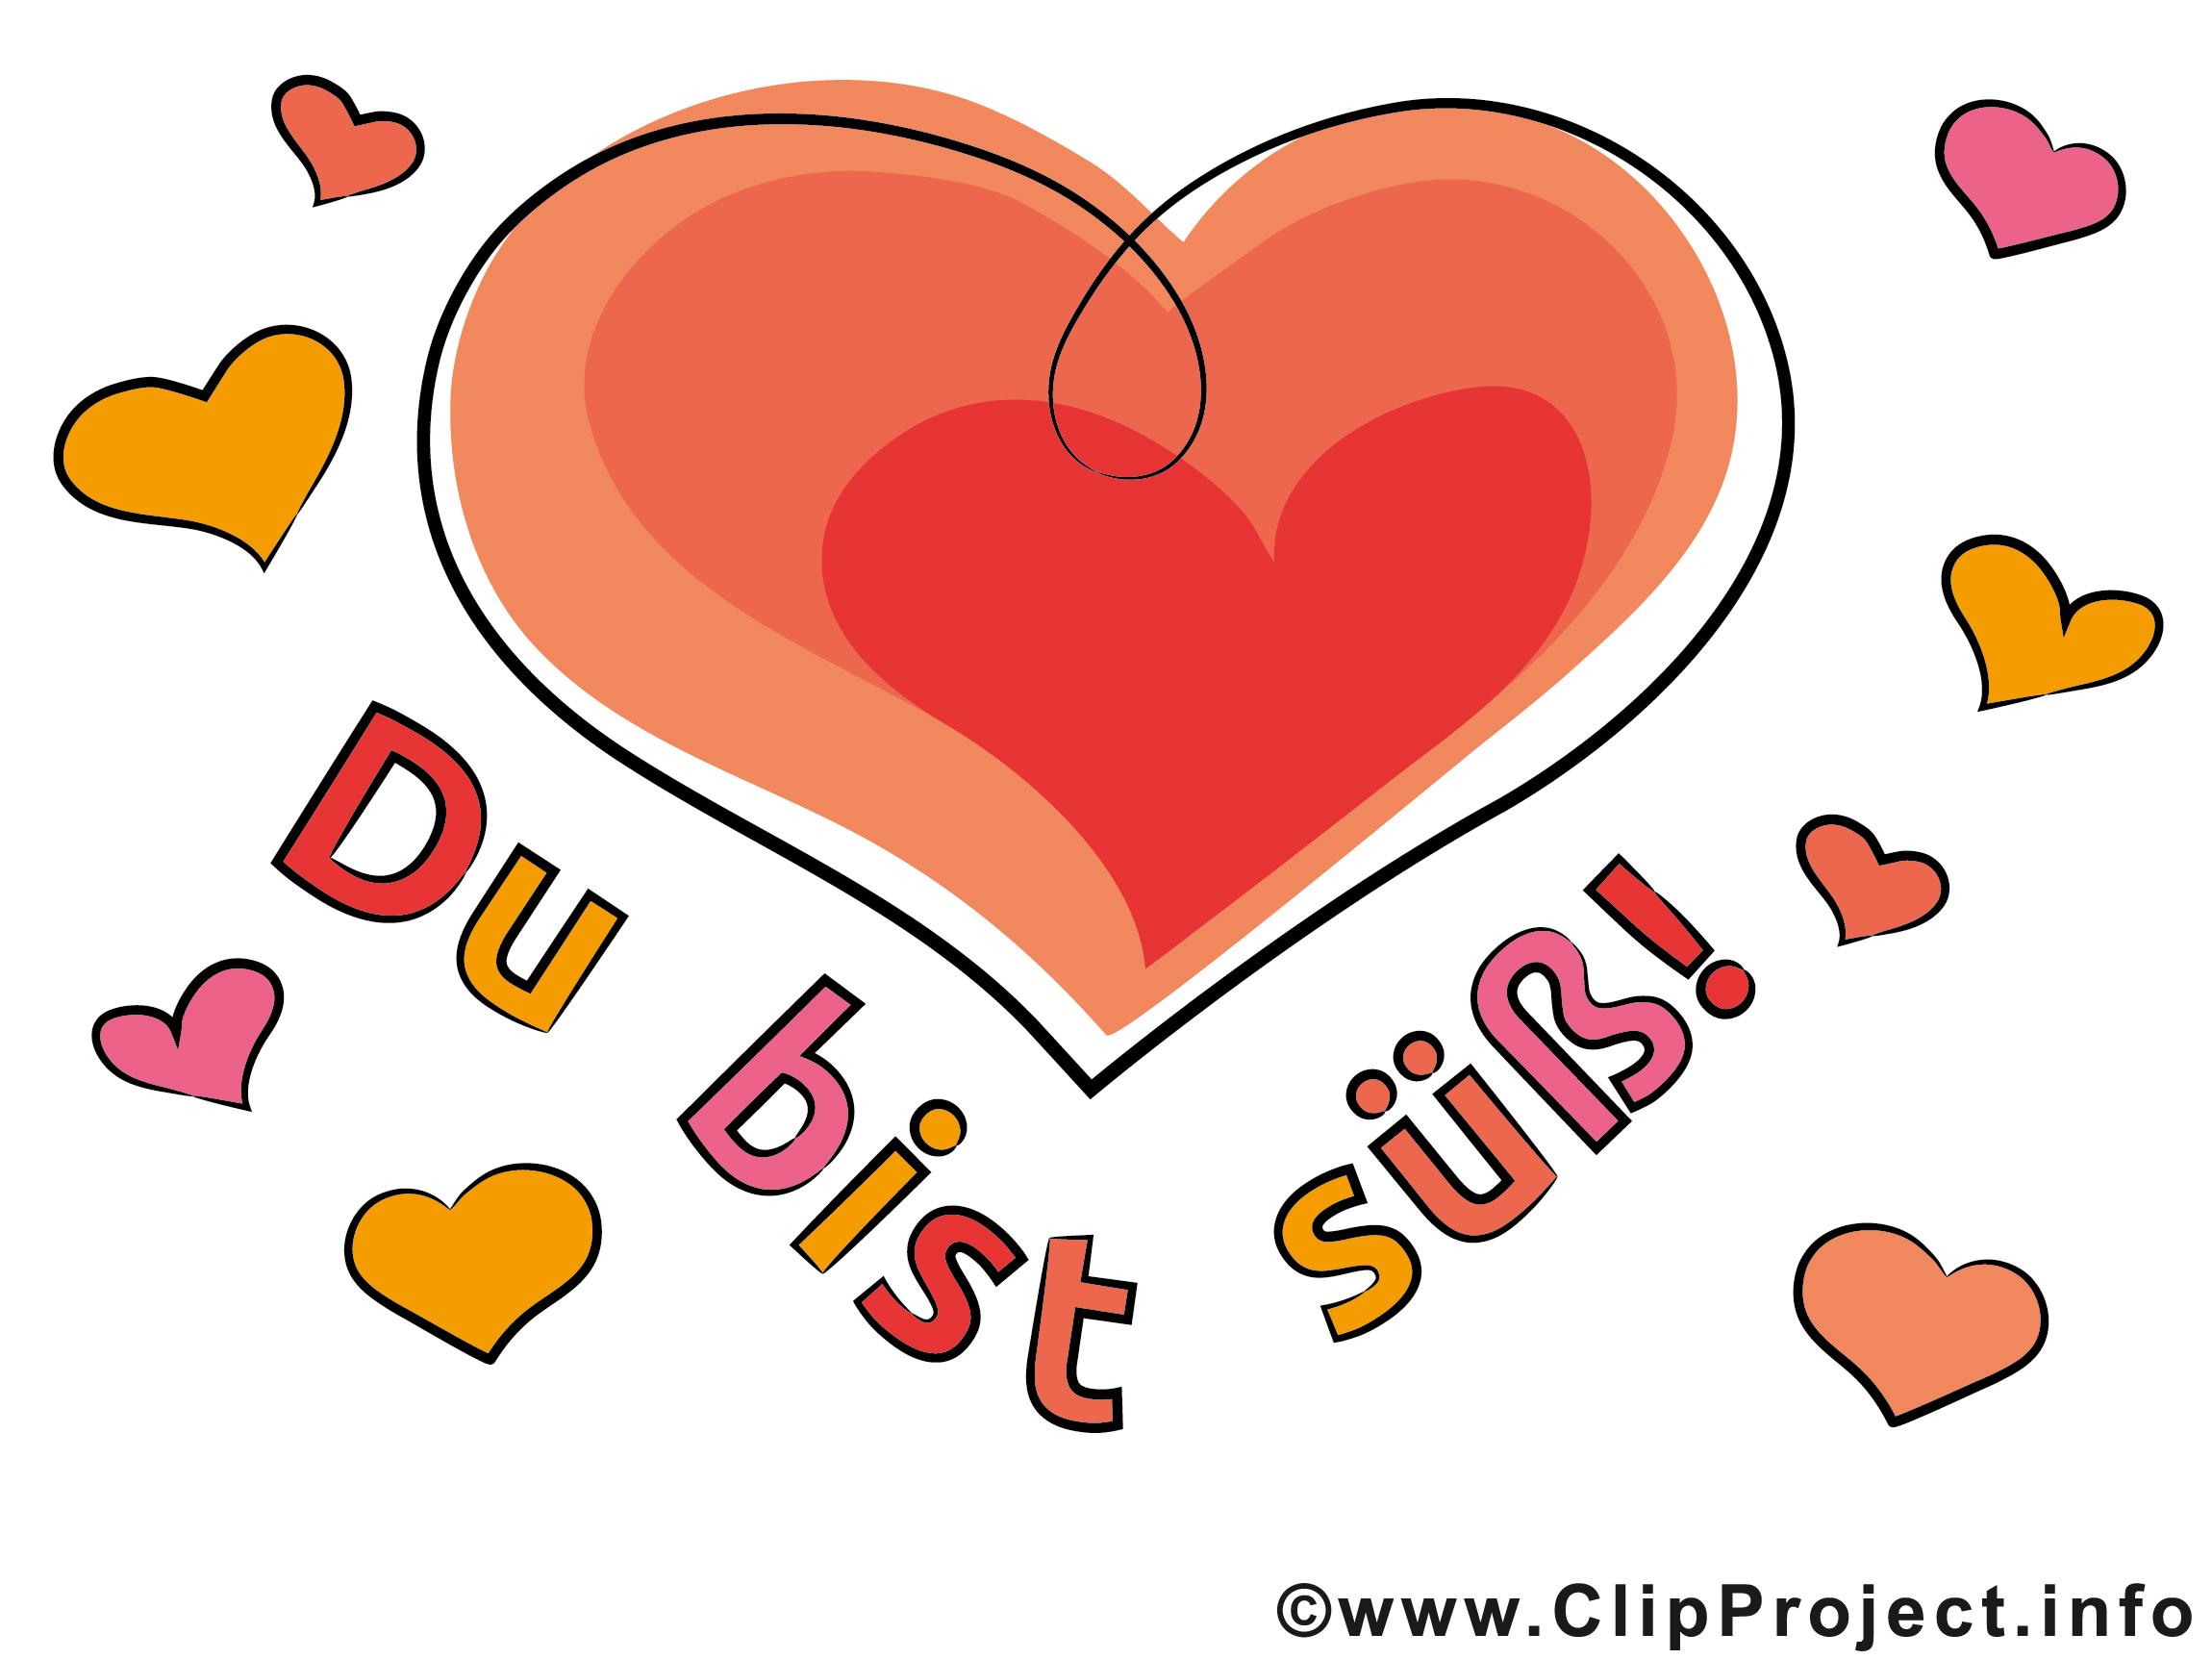 Süß Liebe